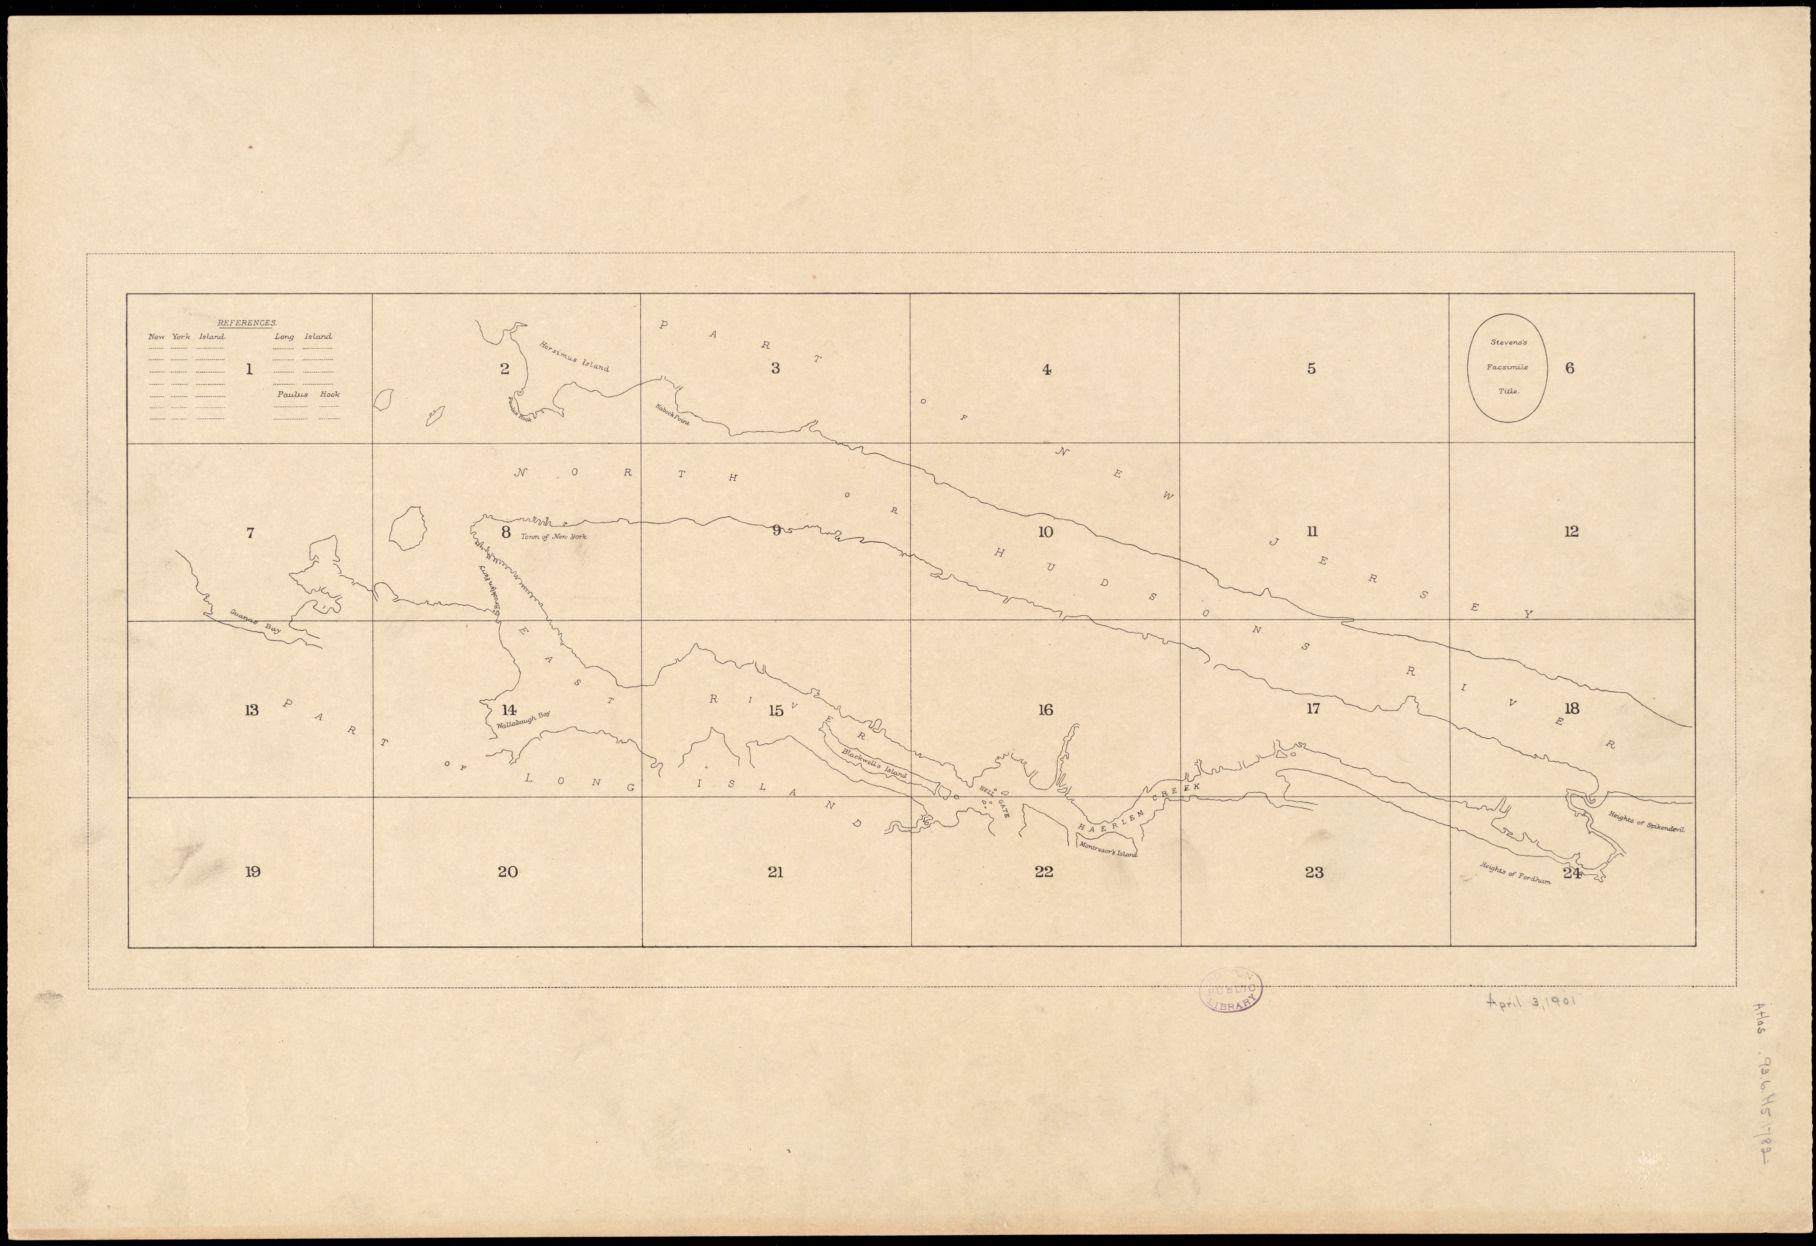 B. F. Stevens's facsimile of the unpublished British head quarters coloured manuscript map of New York & environs (1782)